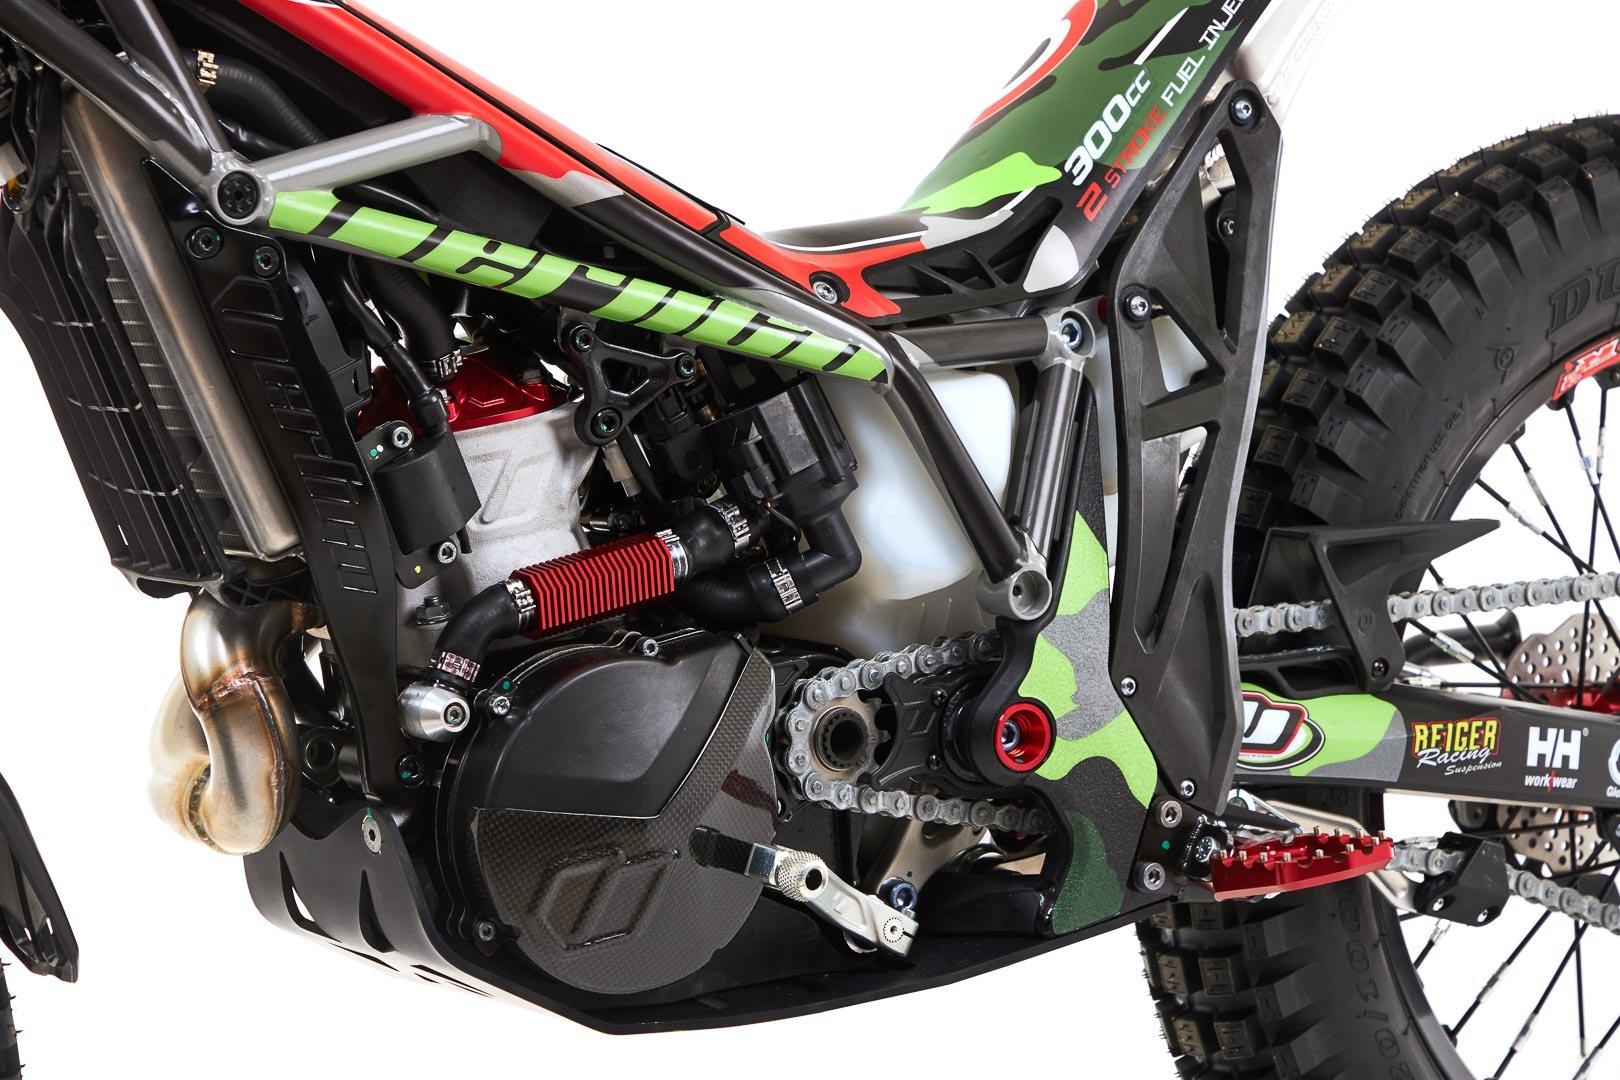 2020 Vertigo Vertical R2 First Look - trials motorcycle